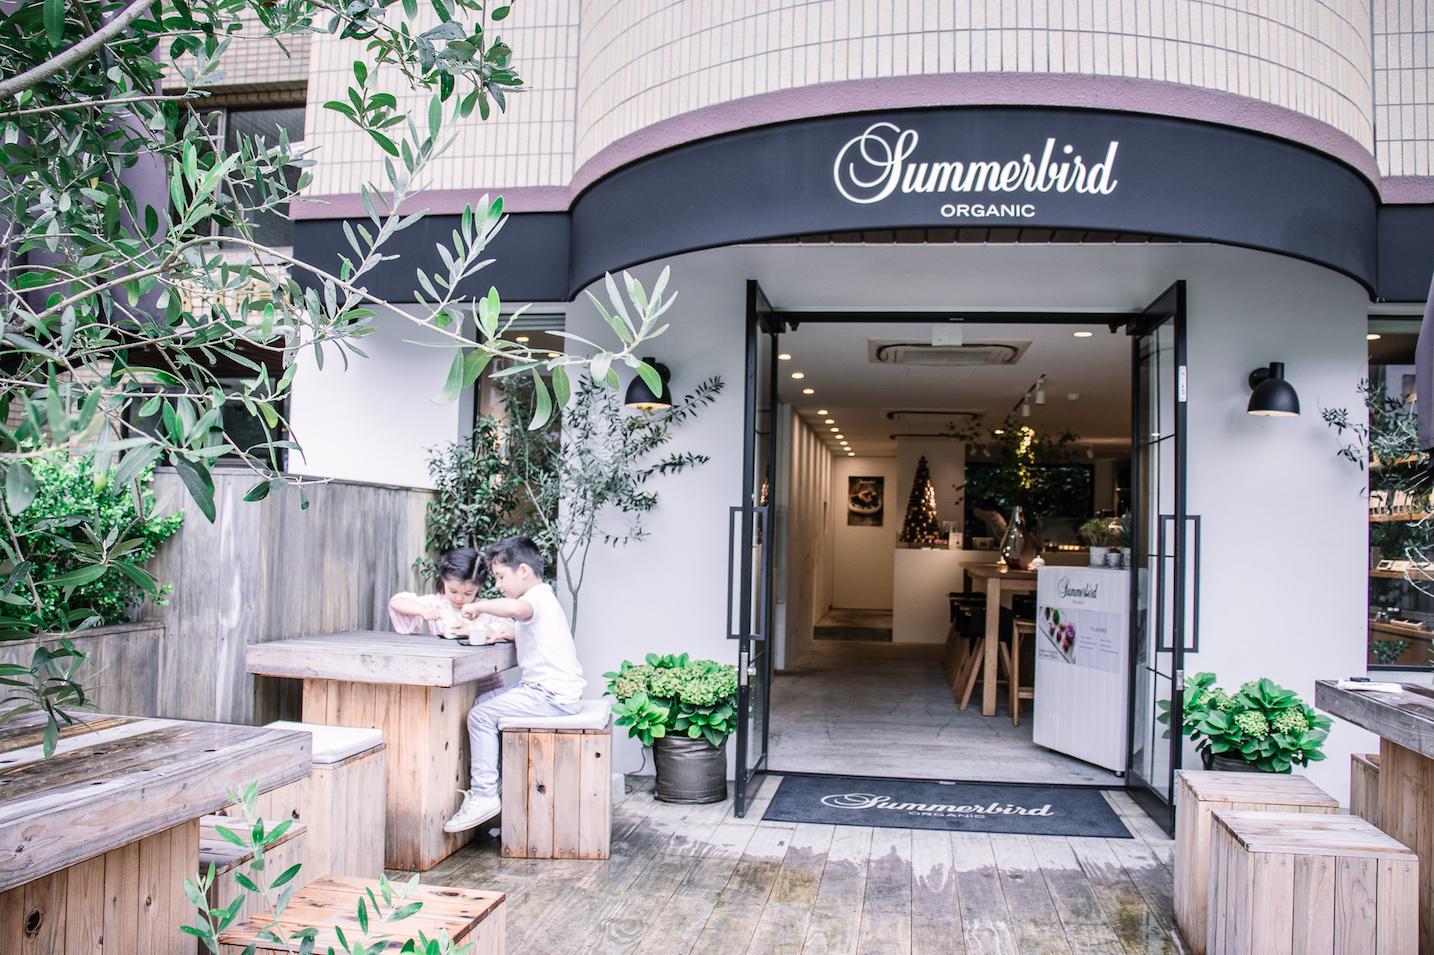 Nicolai Bergmann Summerbird organic ice cream, Aoyama Tokyo terrace